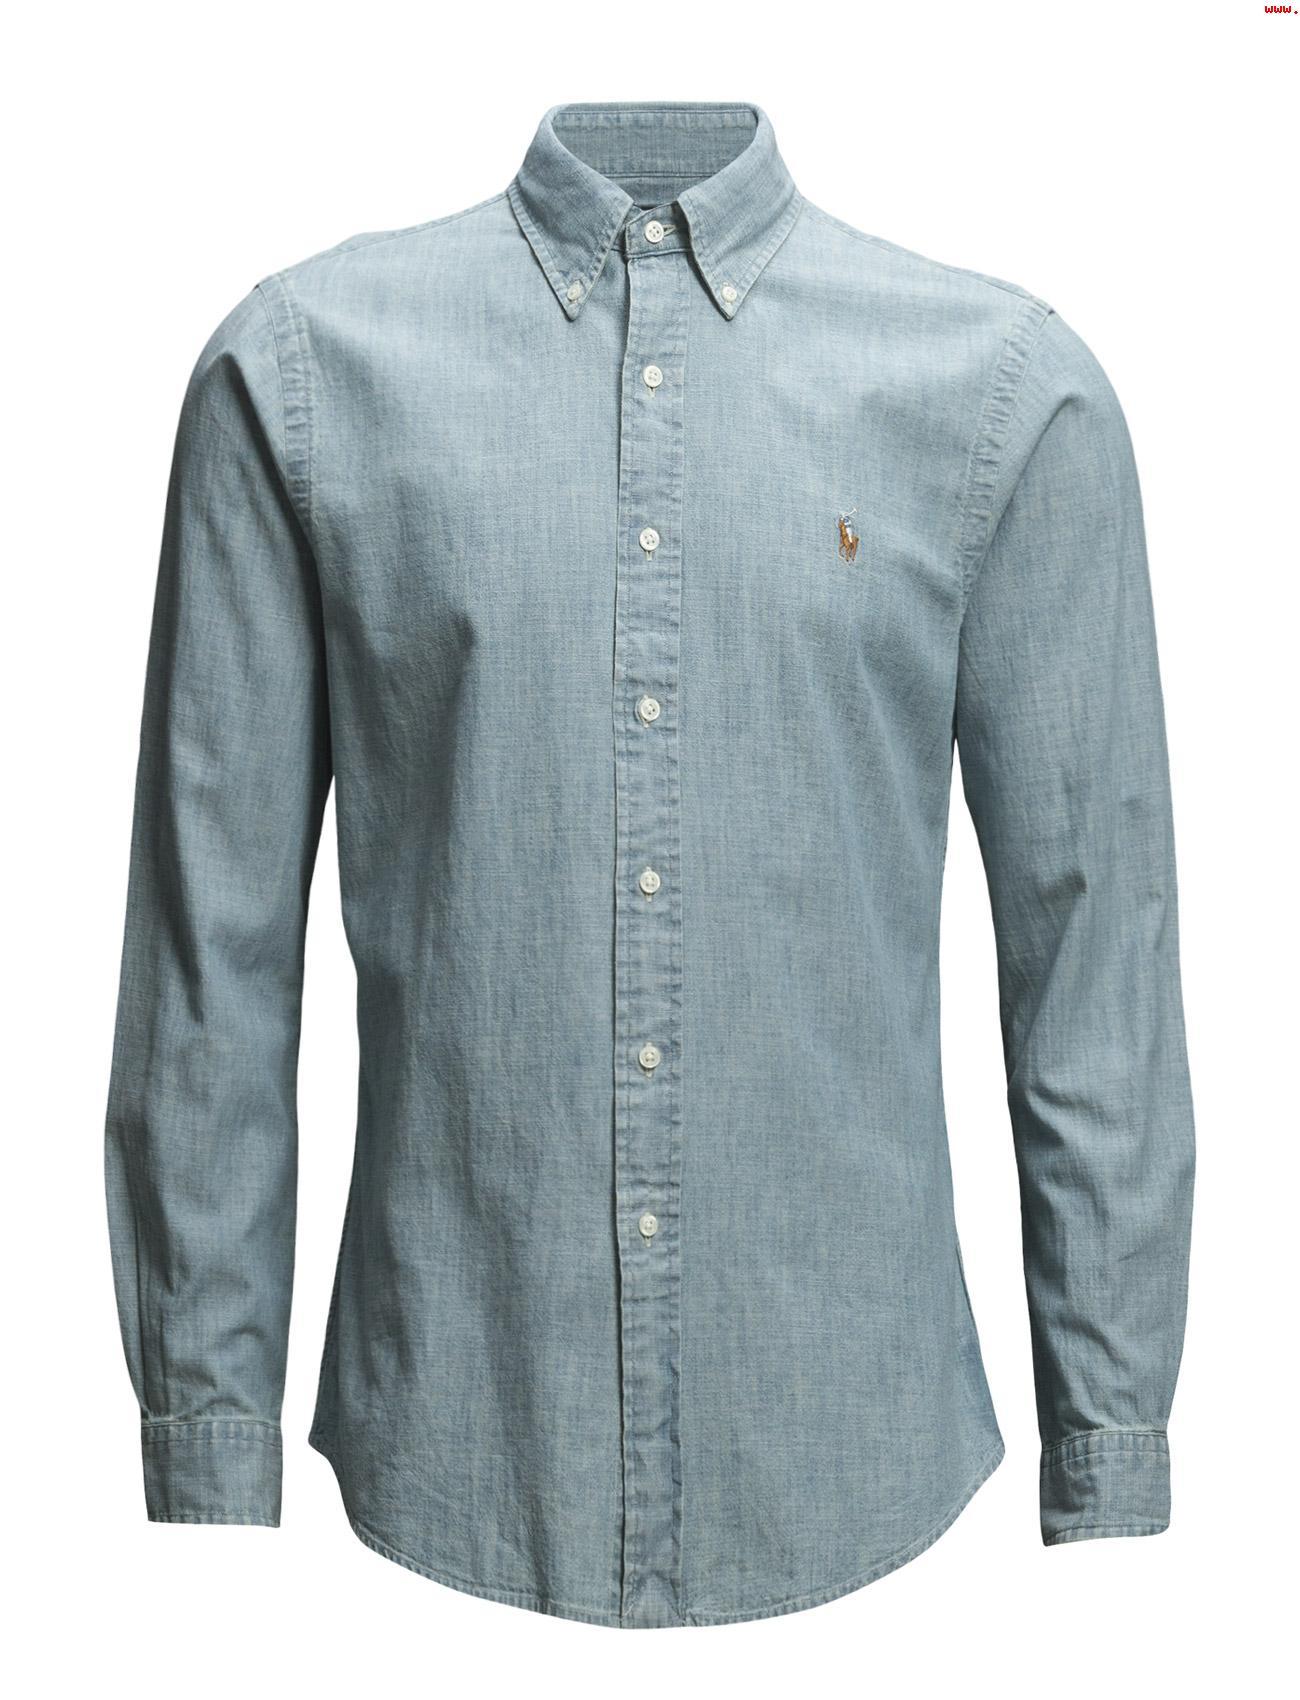 6f090f883d2c Ralph Lauren Casual Denim Shirt. Slim Fit in Light Wash - INTOTO7